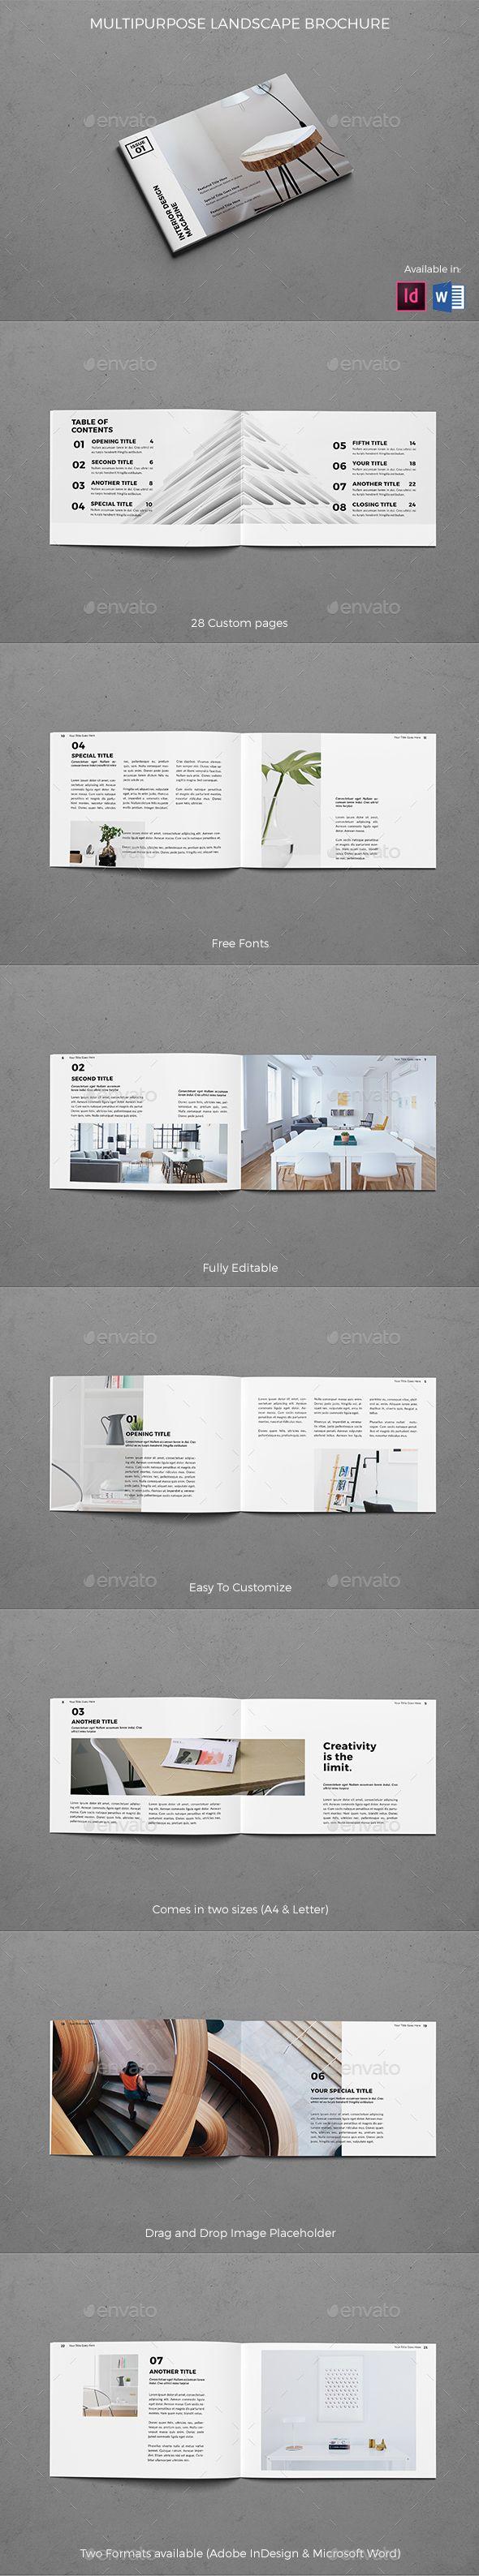 Modern Architecture Landscape Brochure - #Brochures Print #Templates ...